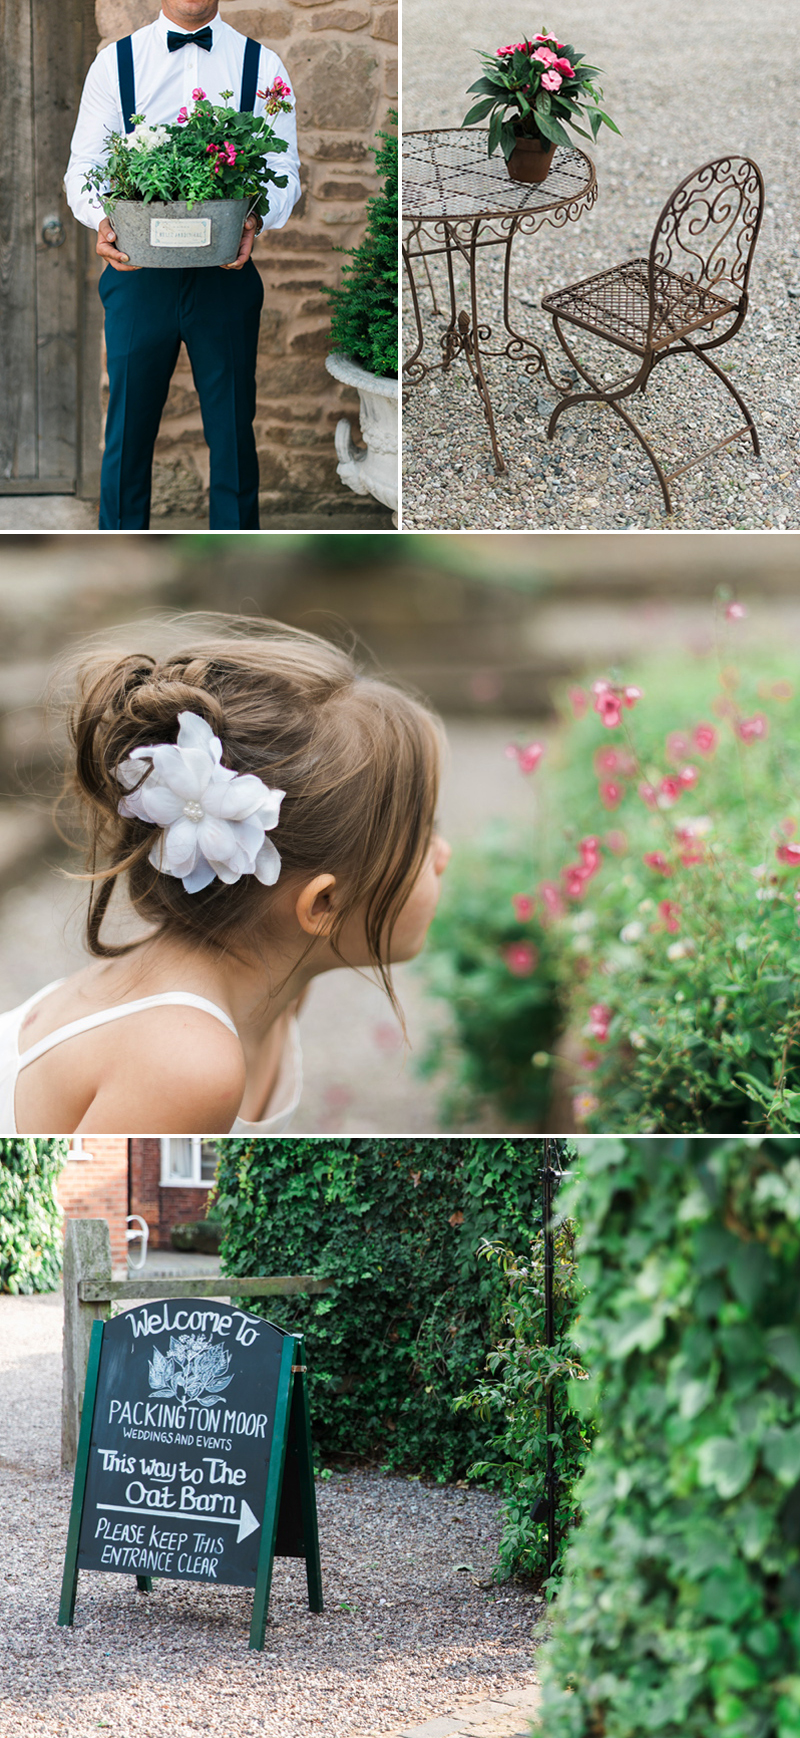 wedding-venue-photography-tips-theresa-furey-photography-coco-wedding-venues-002